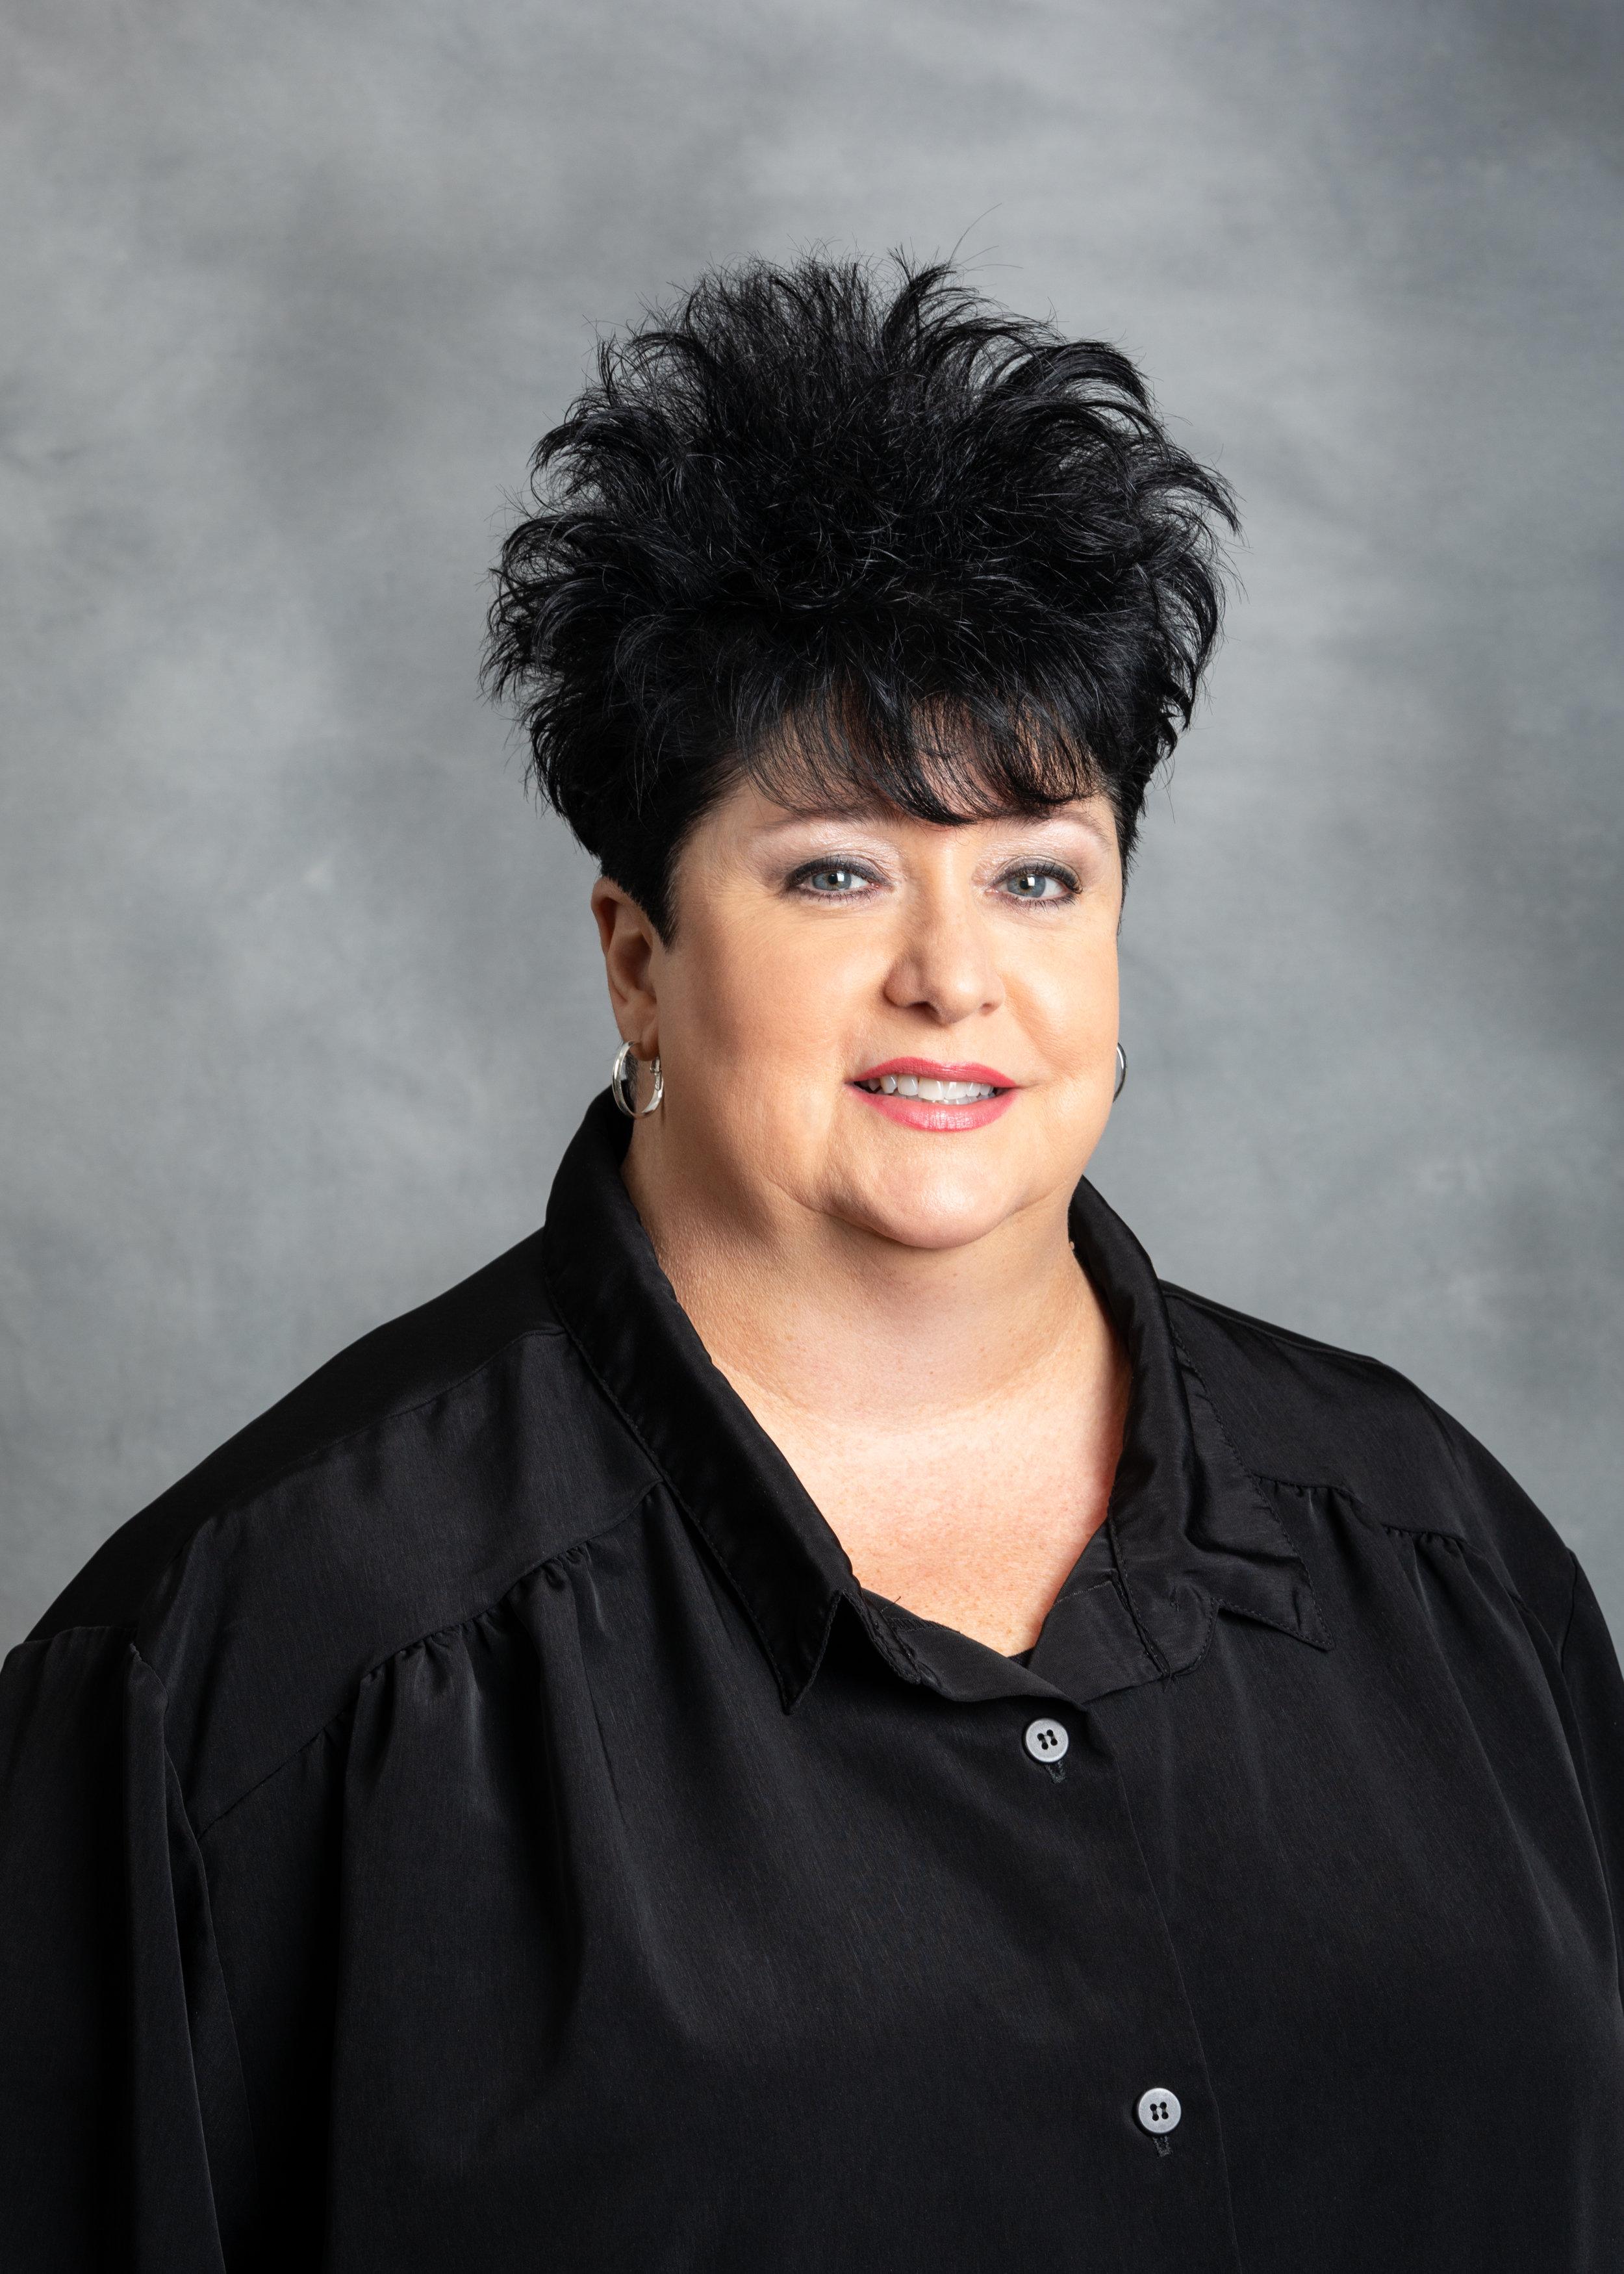 Cheryl Billingsley  Office Manager / Executive Assistant  (330) 926-2508  cbillingsley@summitlandbank.org